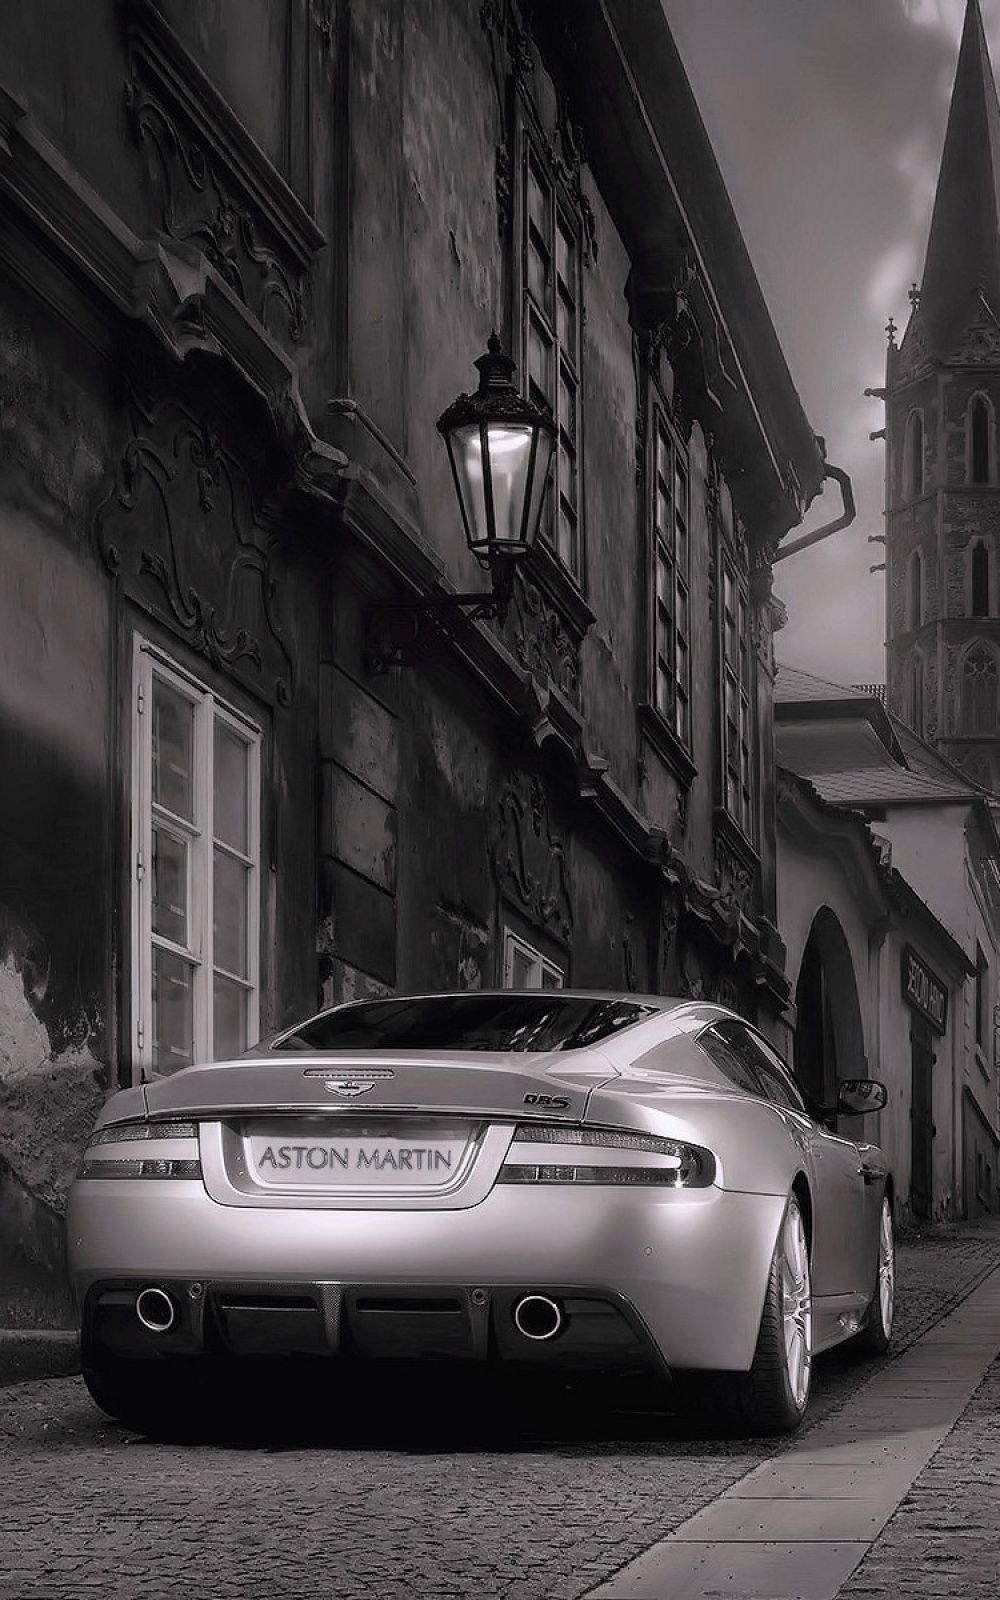 Black And White Aston Martin Back Mobile Wallpaper Iphone Android Samsung Pixel Xiaomi Aston Martin Dbs Aston Martin Aston